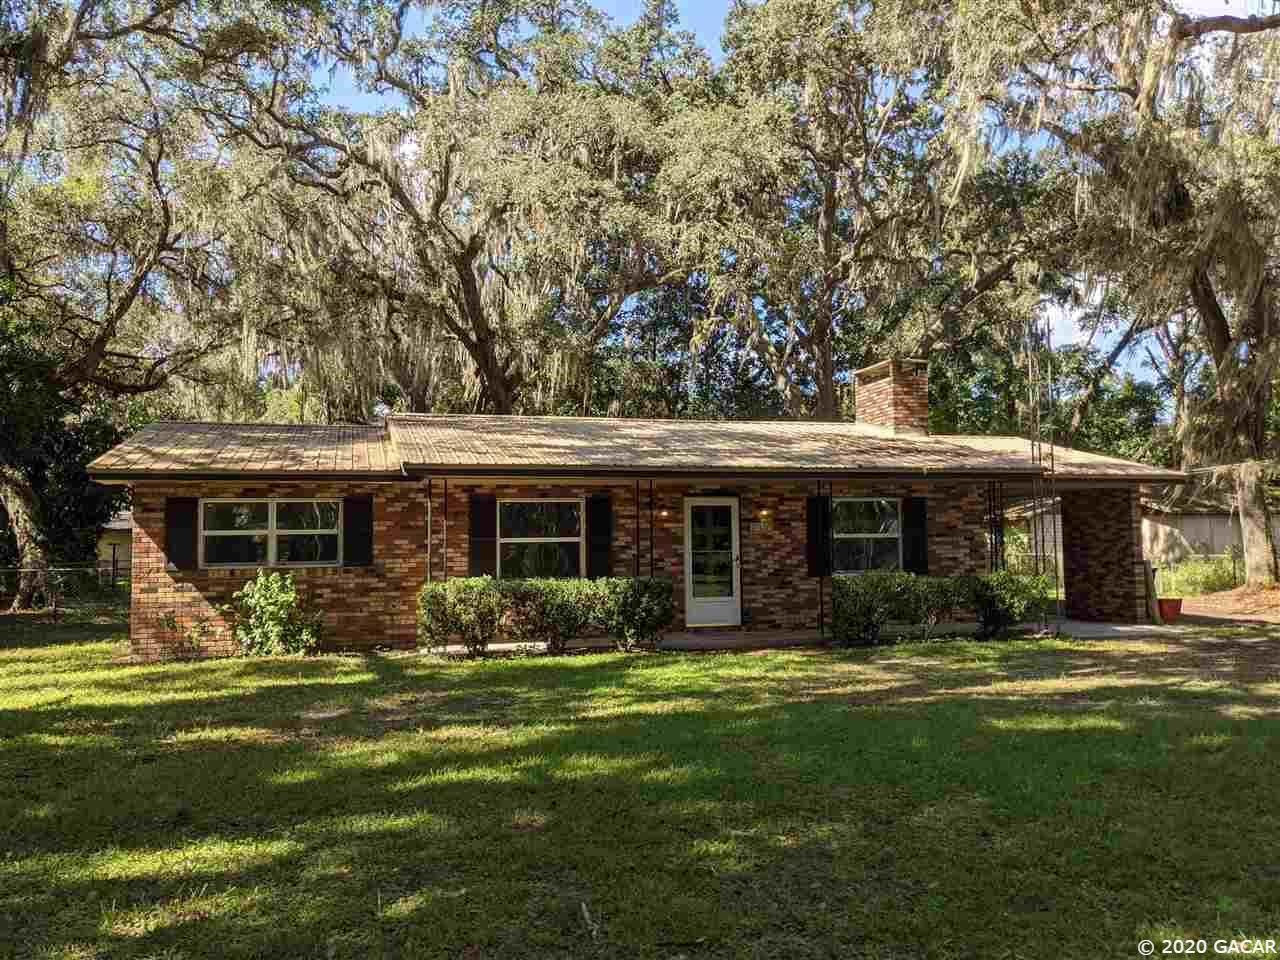 2330 SE 45 Terrace, Gainesville, FL 32641 - #: 438892